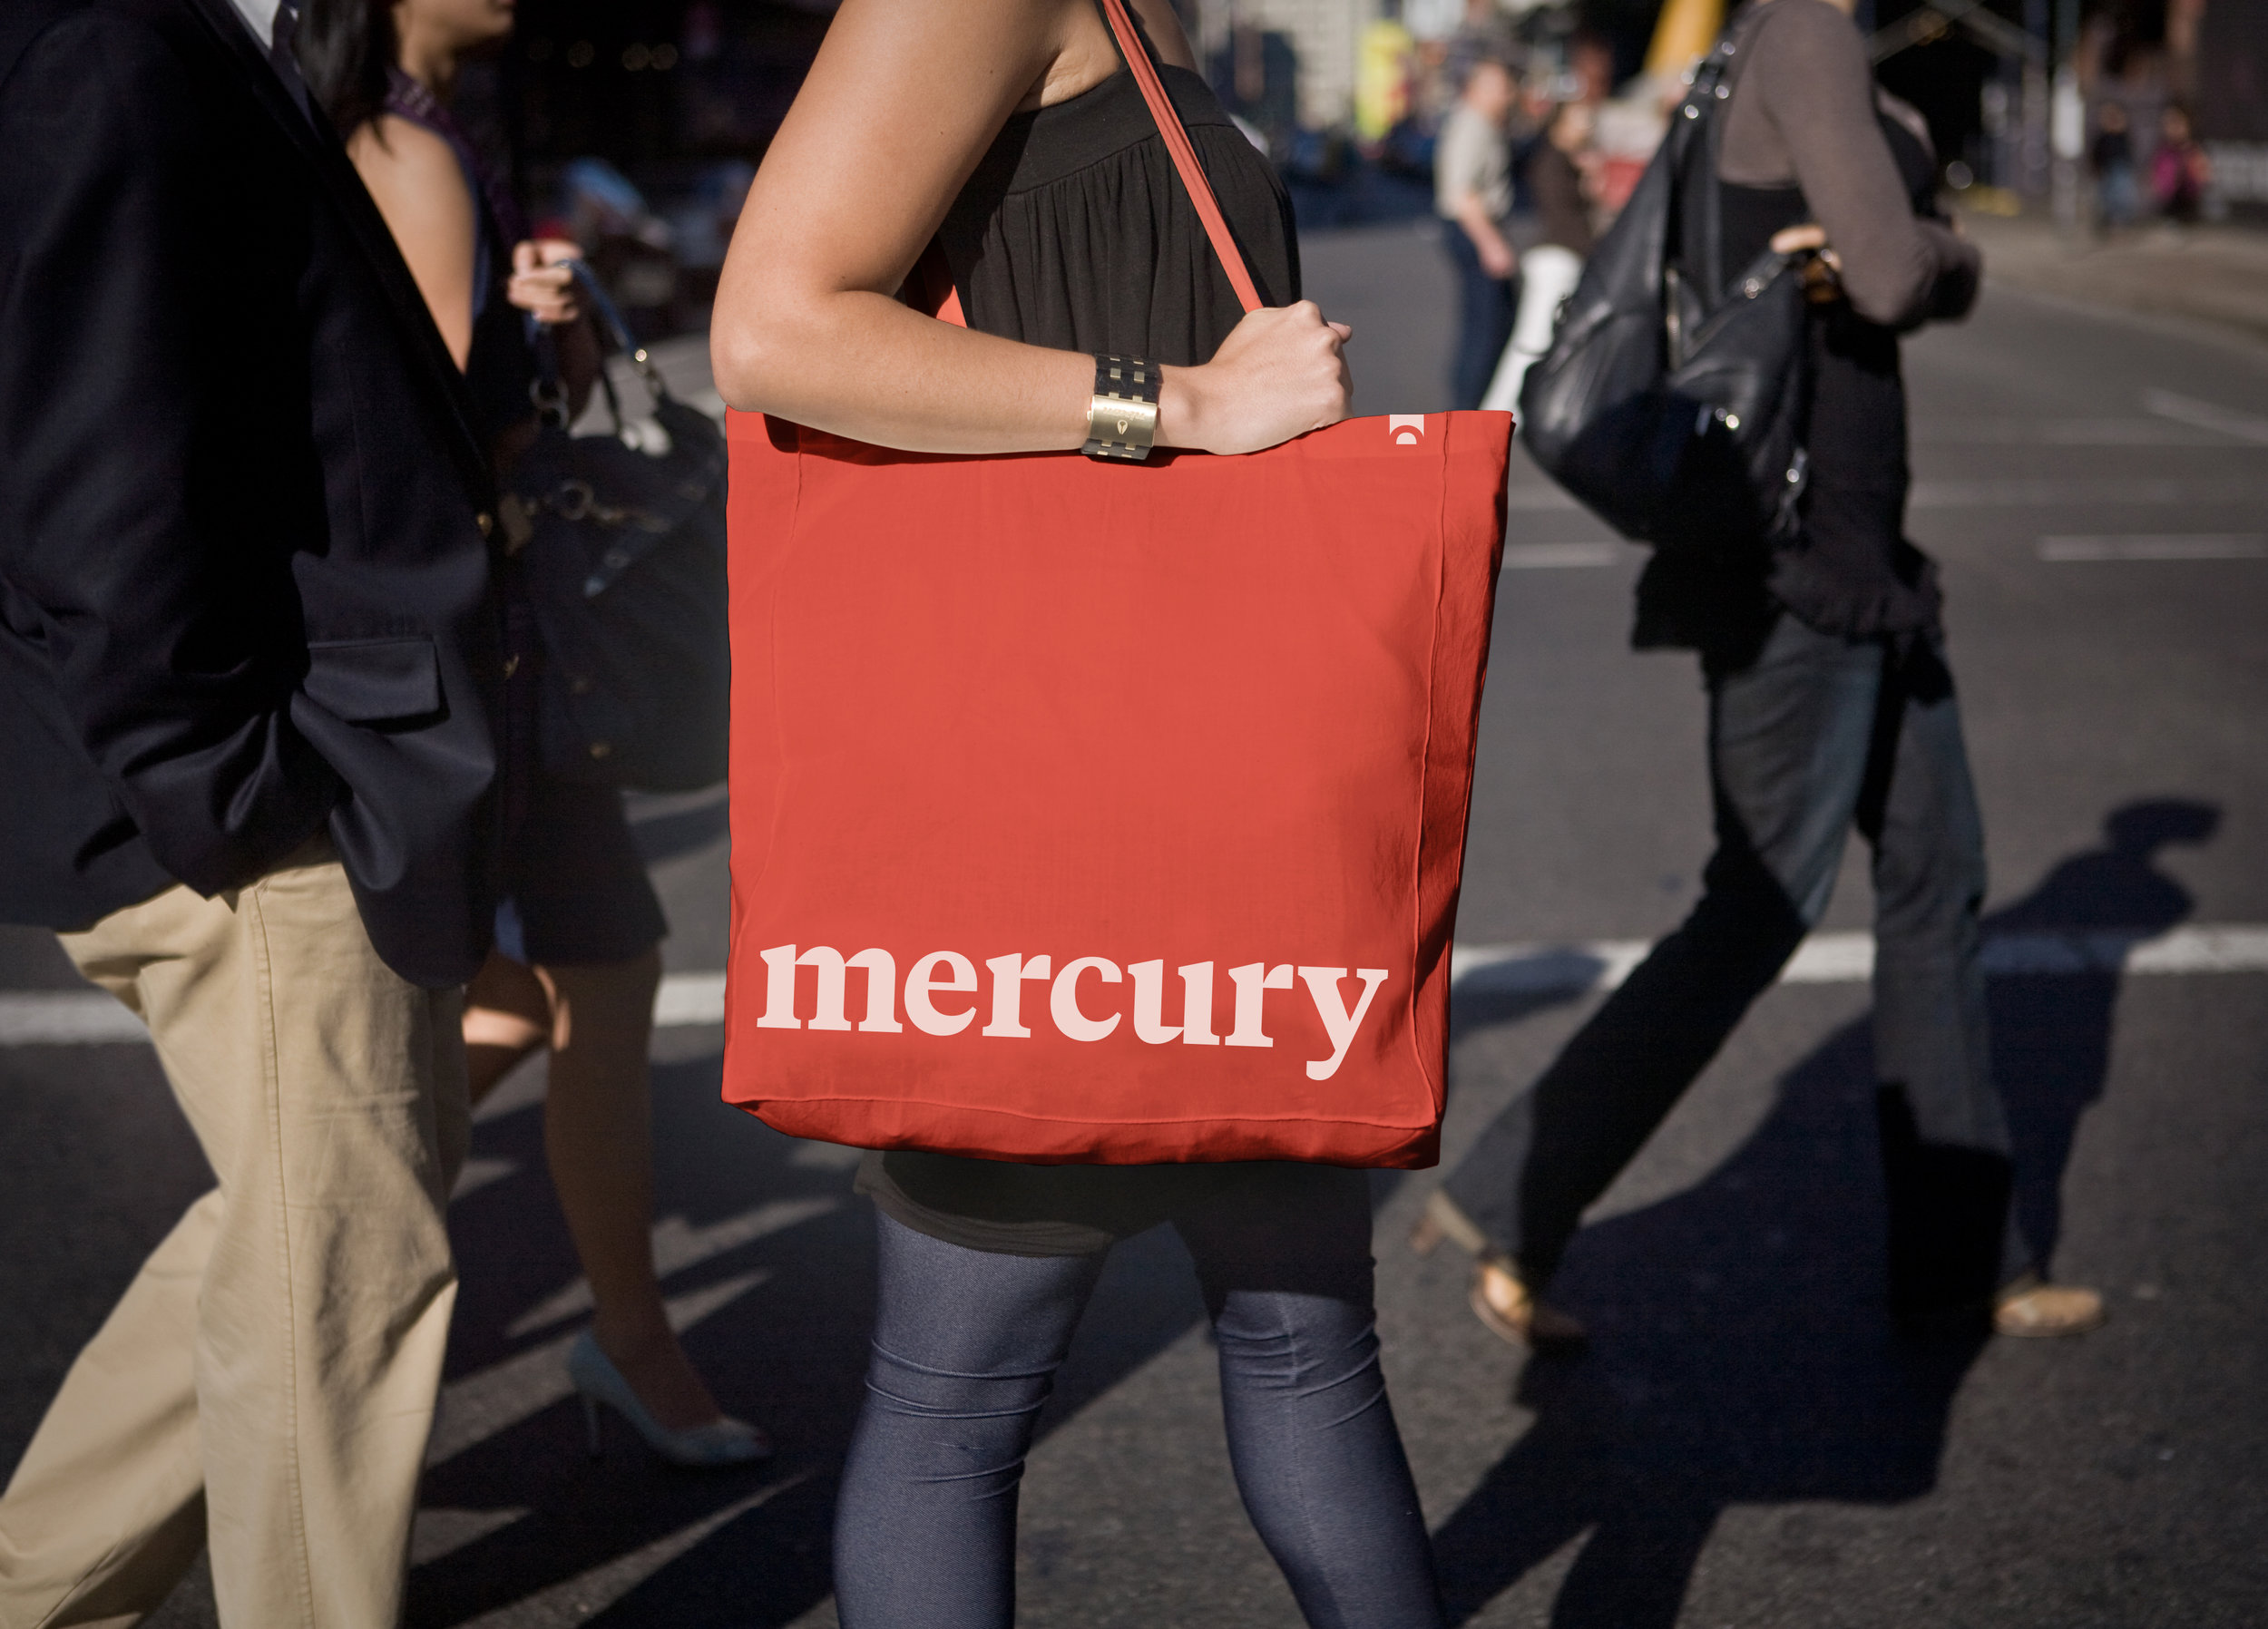 mercury_tote-bag_color.jpg